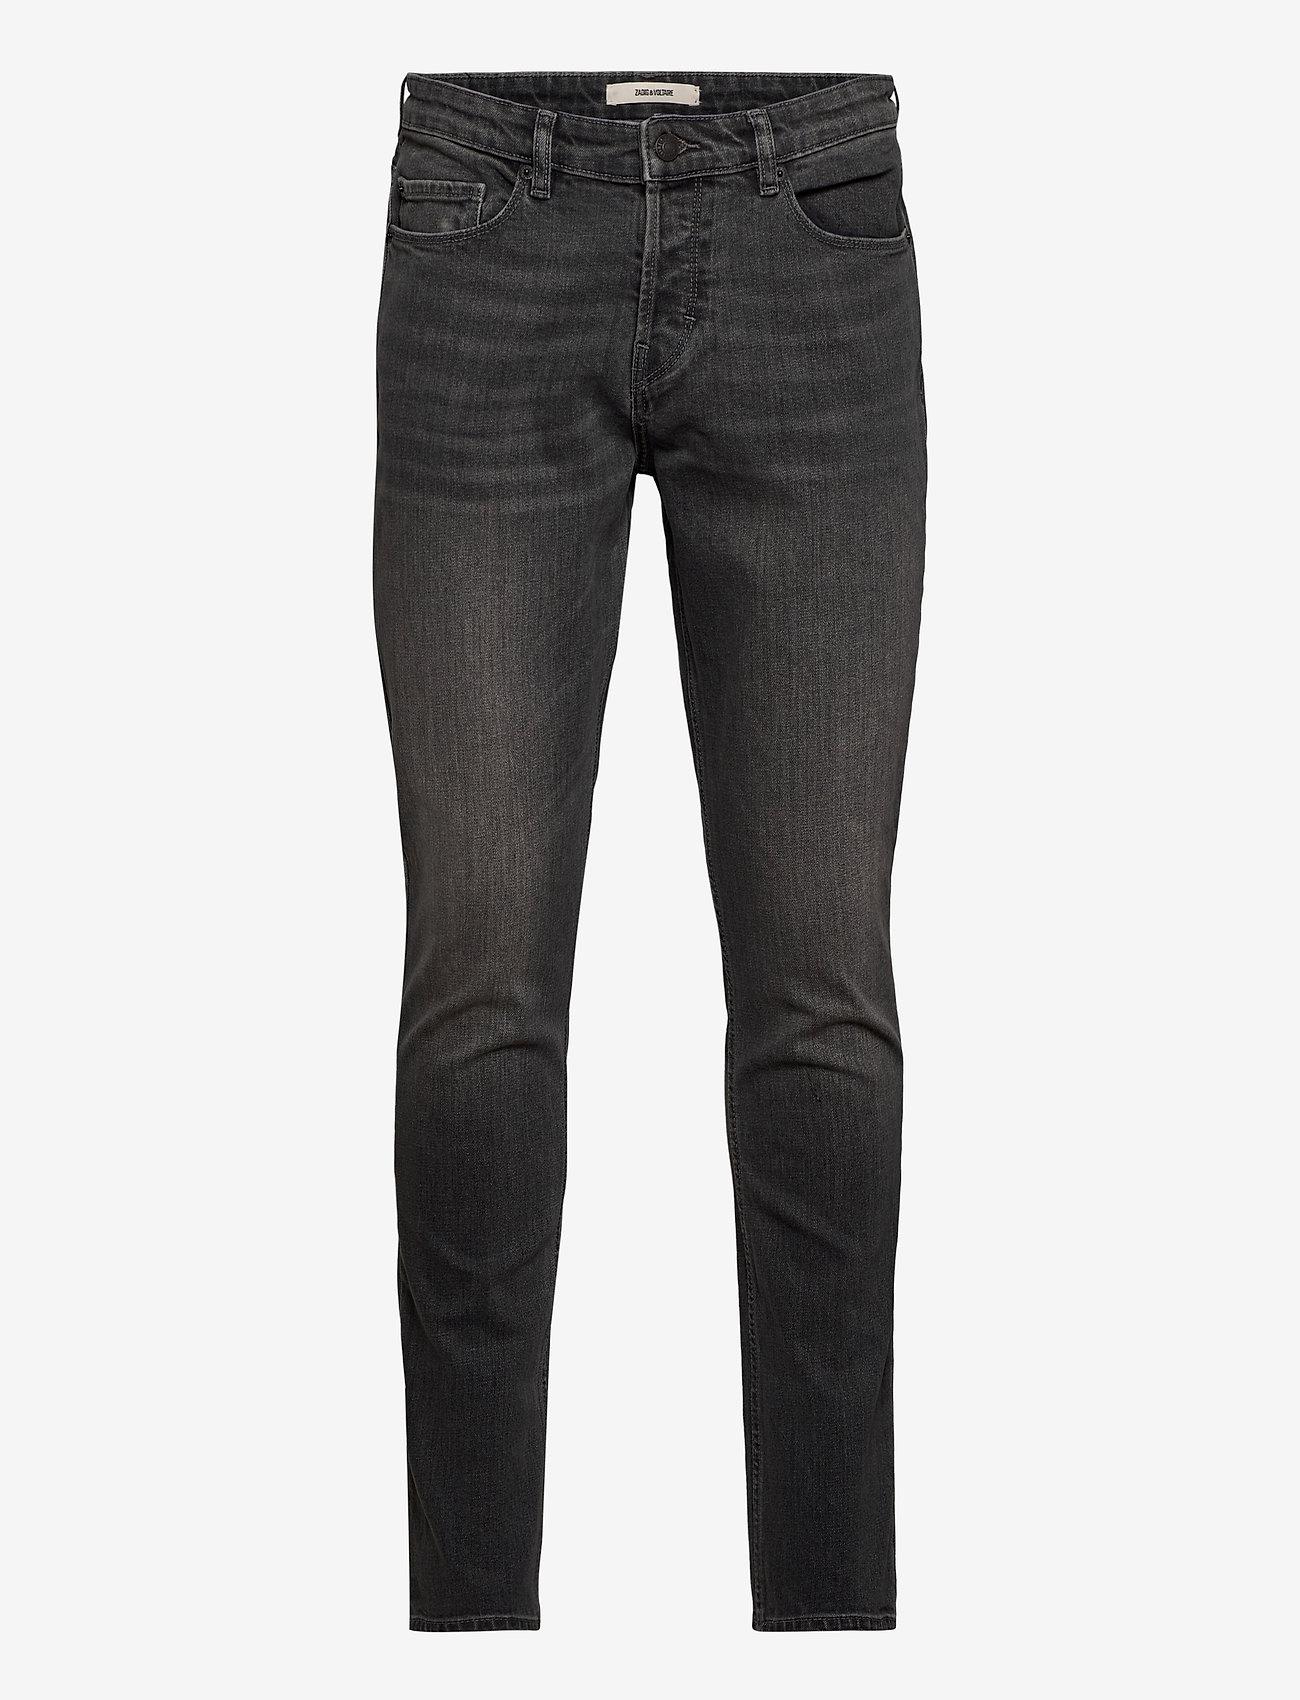 Zadig & Voltaire - DAVID ECO GRIS JEANS - slim jeans - grey - 1